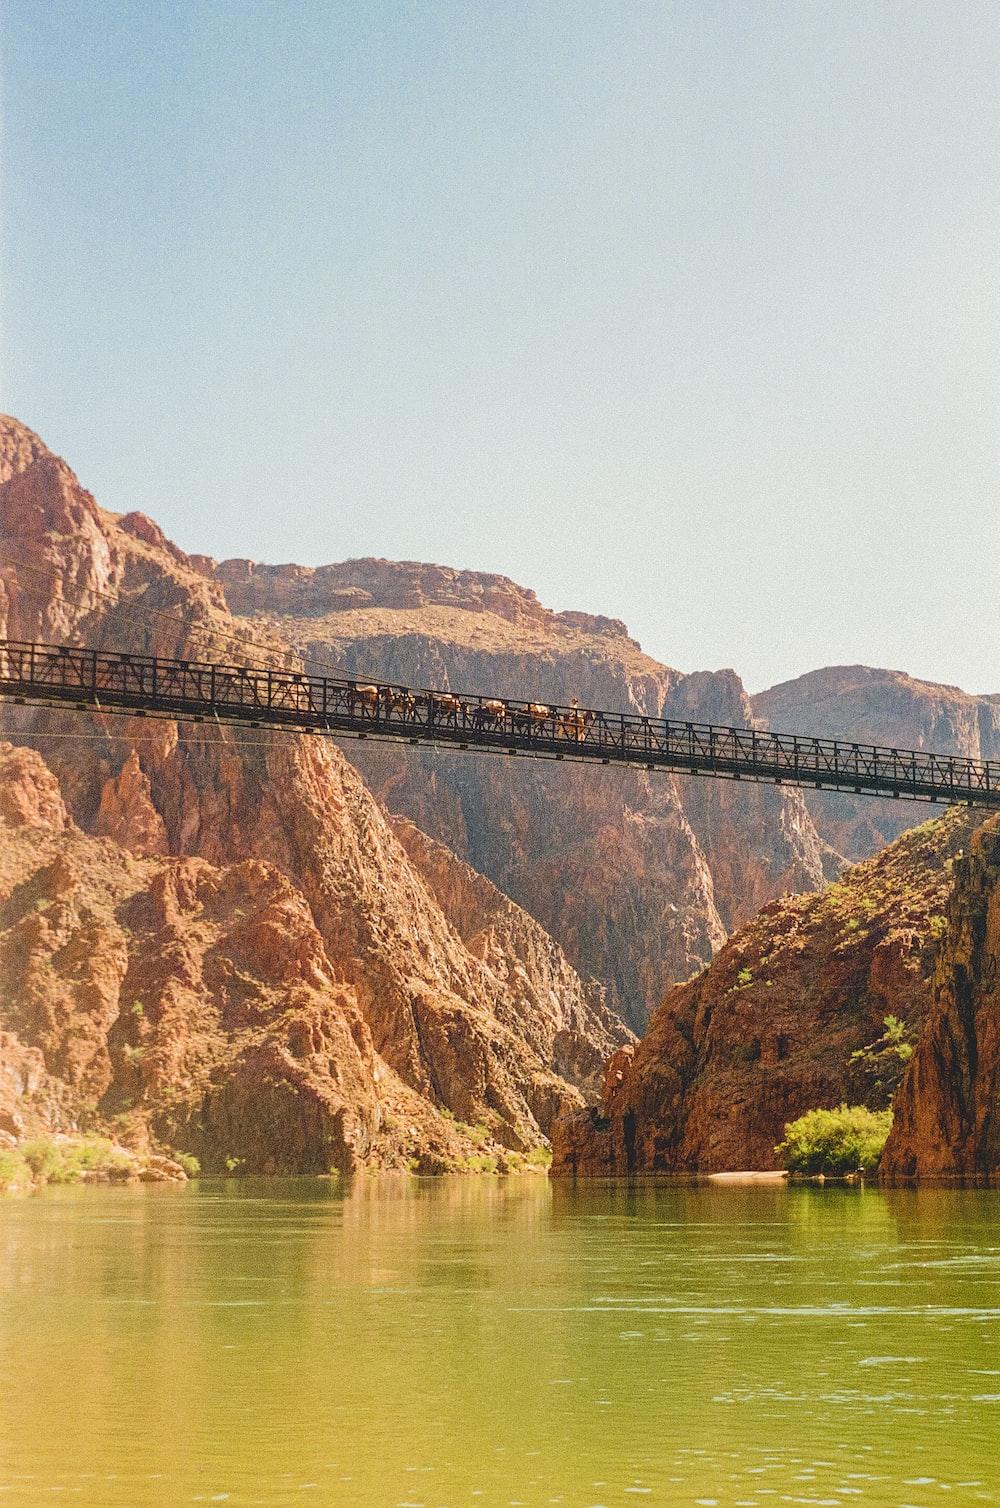 brown bridge over the river